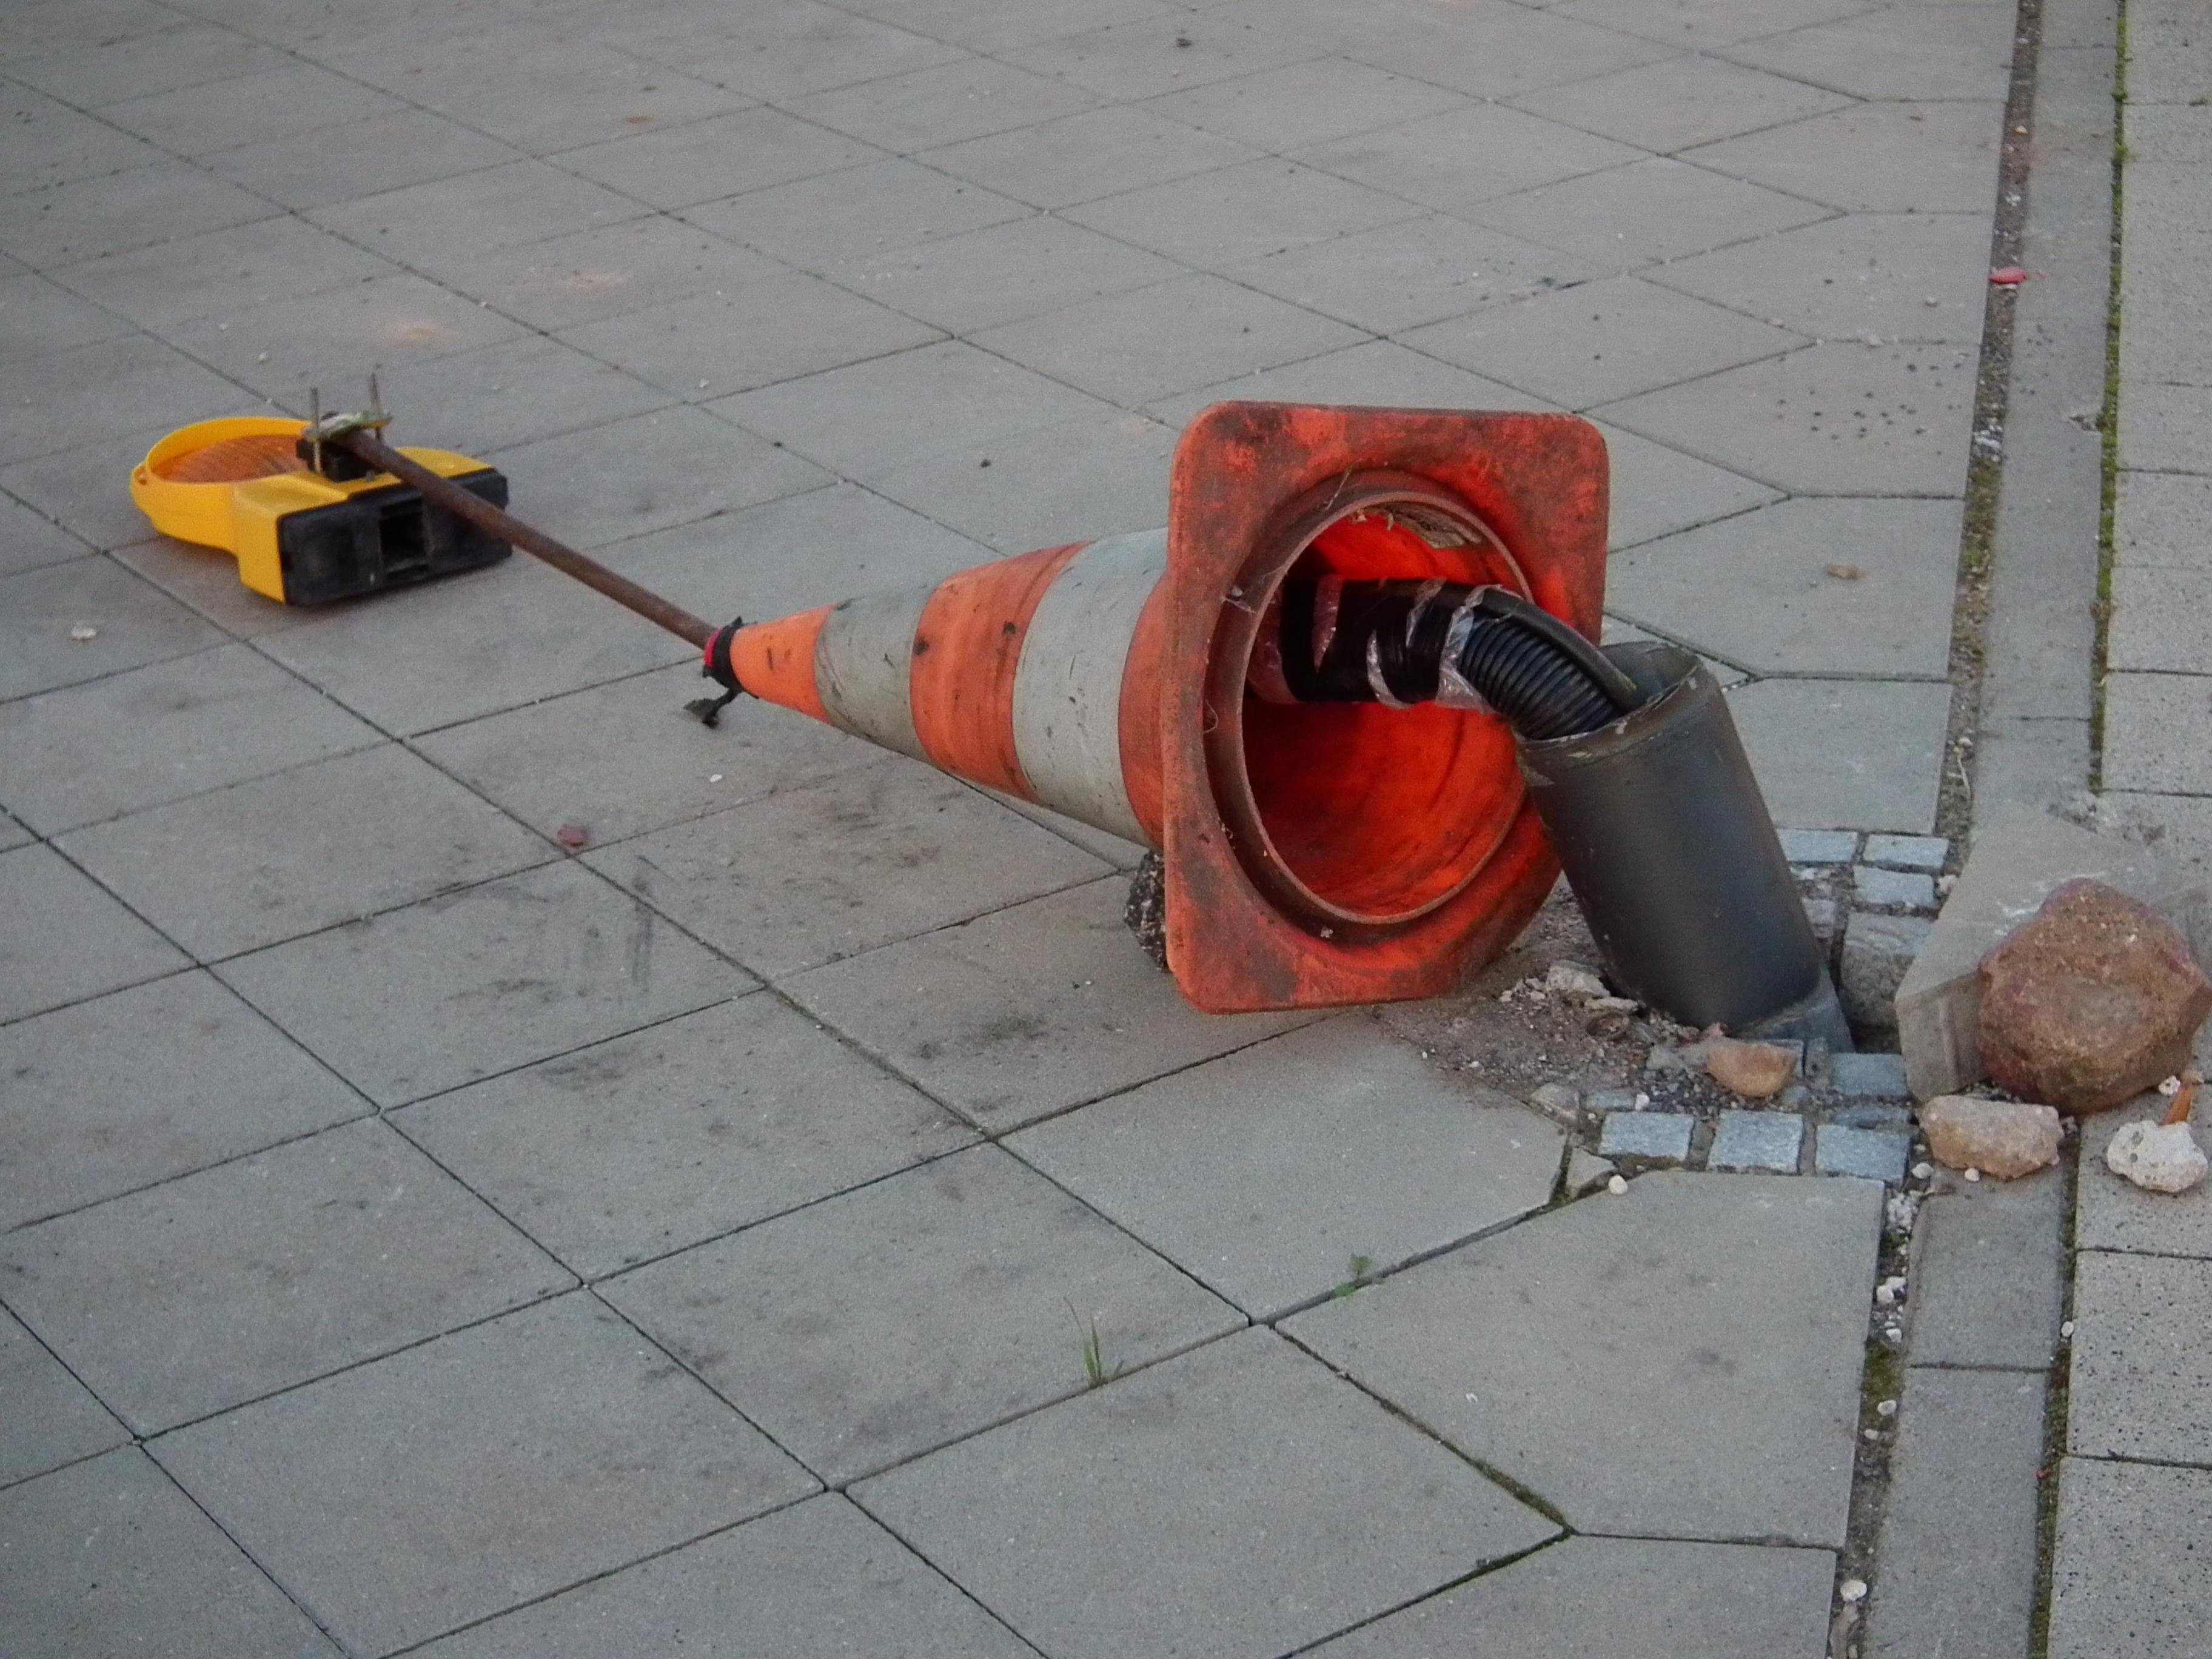 file:umgestürzter pylon zur kabelsicherung - wikimedia commons